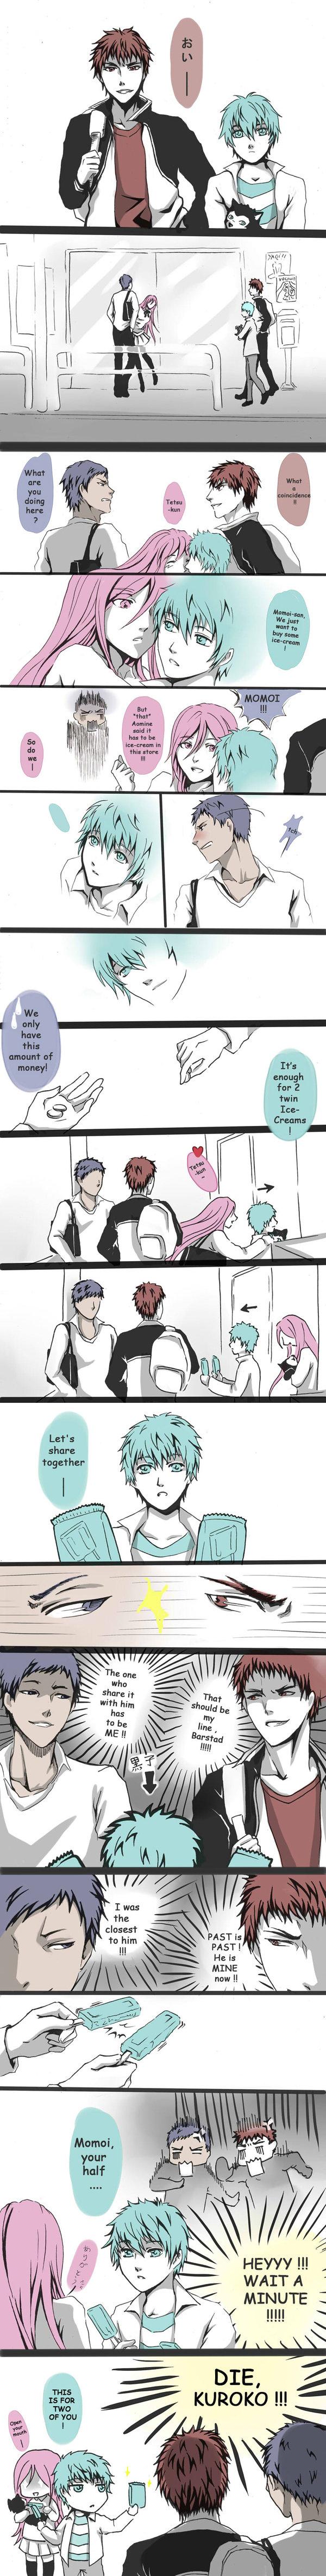 Tags: Anime, Pixiv Id 1408107, Ha2693 (Artist), Kuroko no Basuke, VOCALOID, Aomine Daiki, Kagami Taiga, Hatsune Miku, Kuroko Tetsuya, Tetsuya No.2, Momoi Satsuki, Comic, Kuroko's Basketball